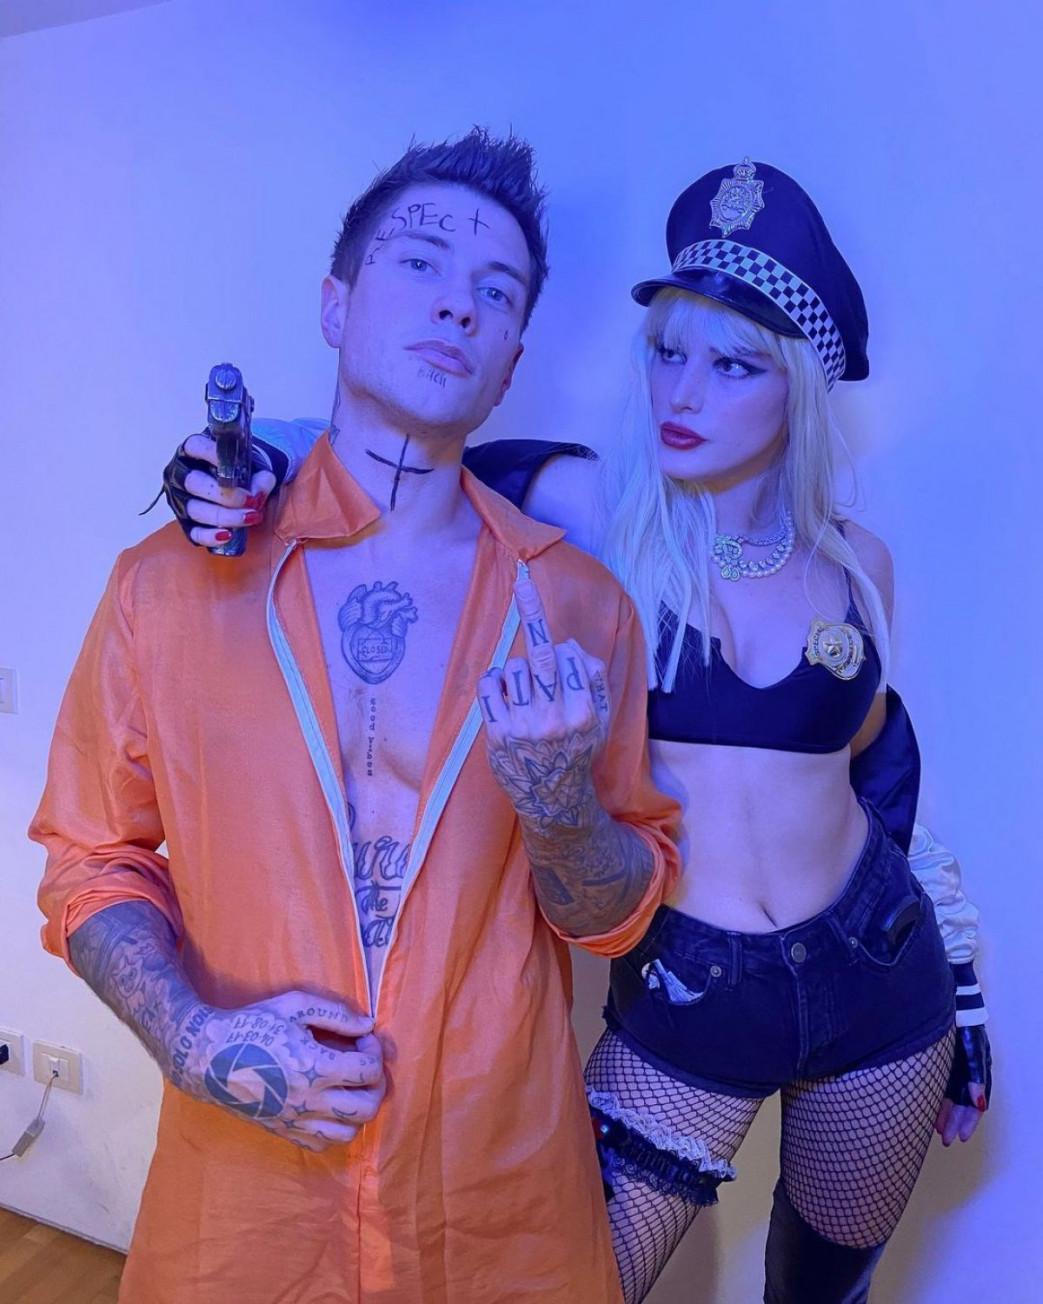 Bella-Thorne-busty-Cop-Halloween-Costume-3.jpg